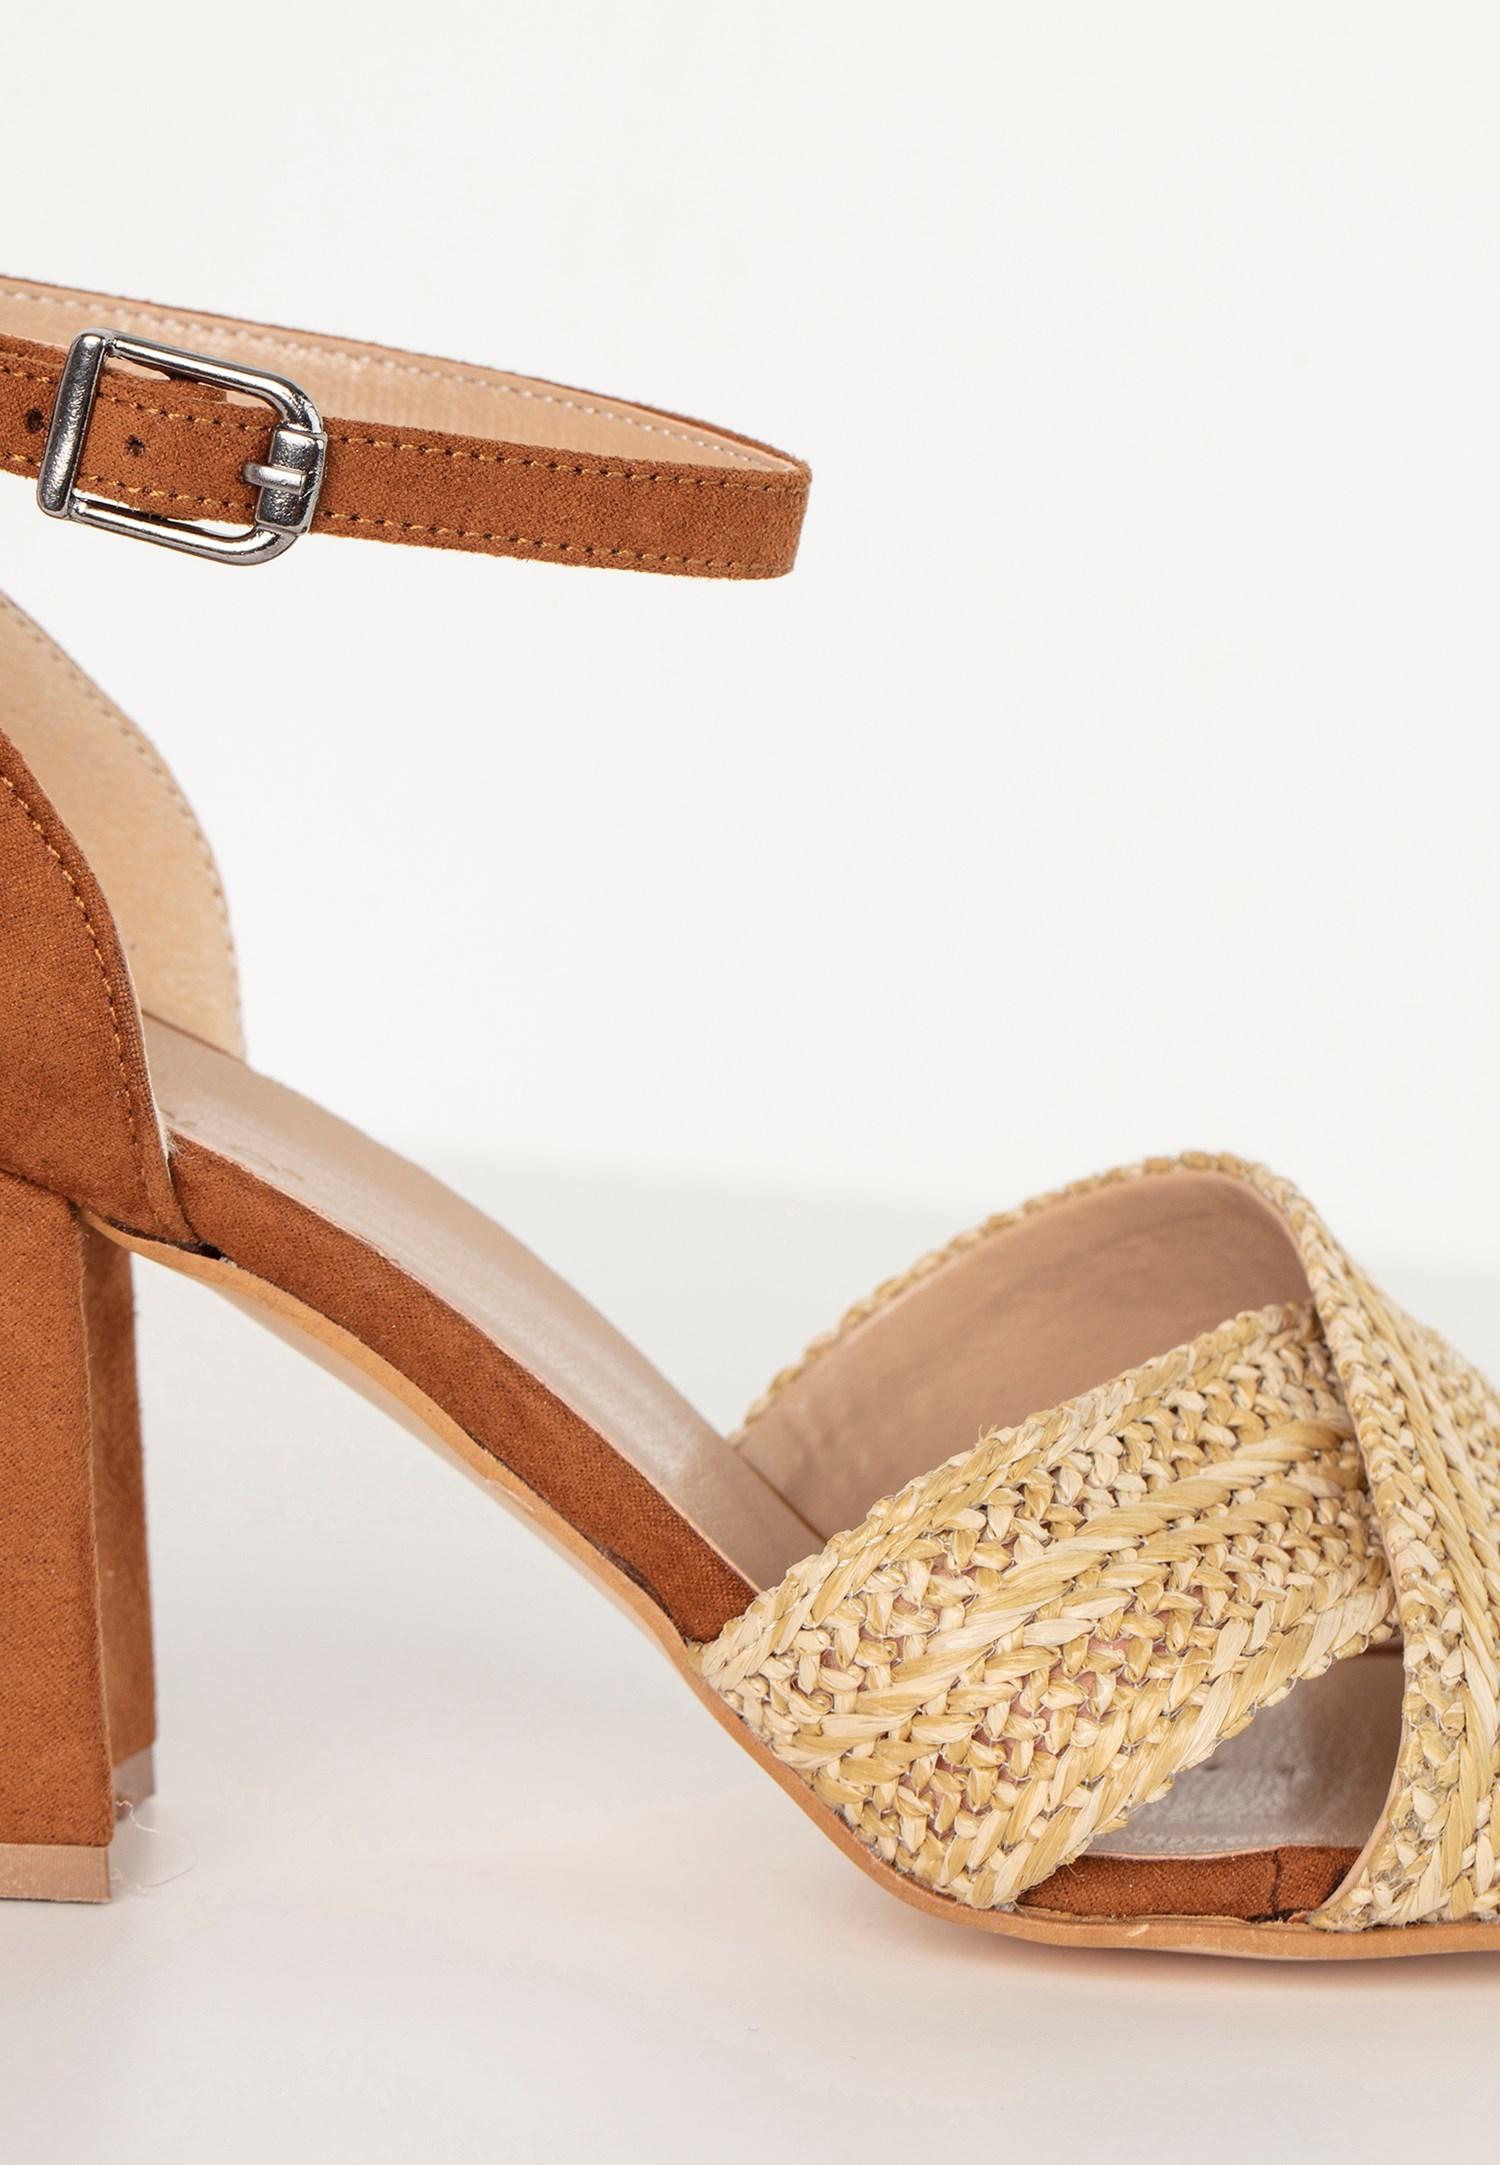 Bayan Kahverengi Topuklu Hasır Ayakkabı